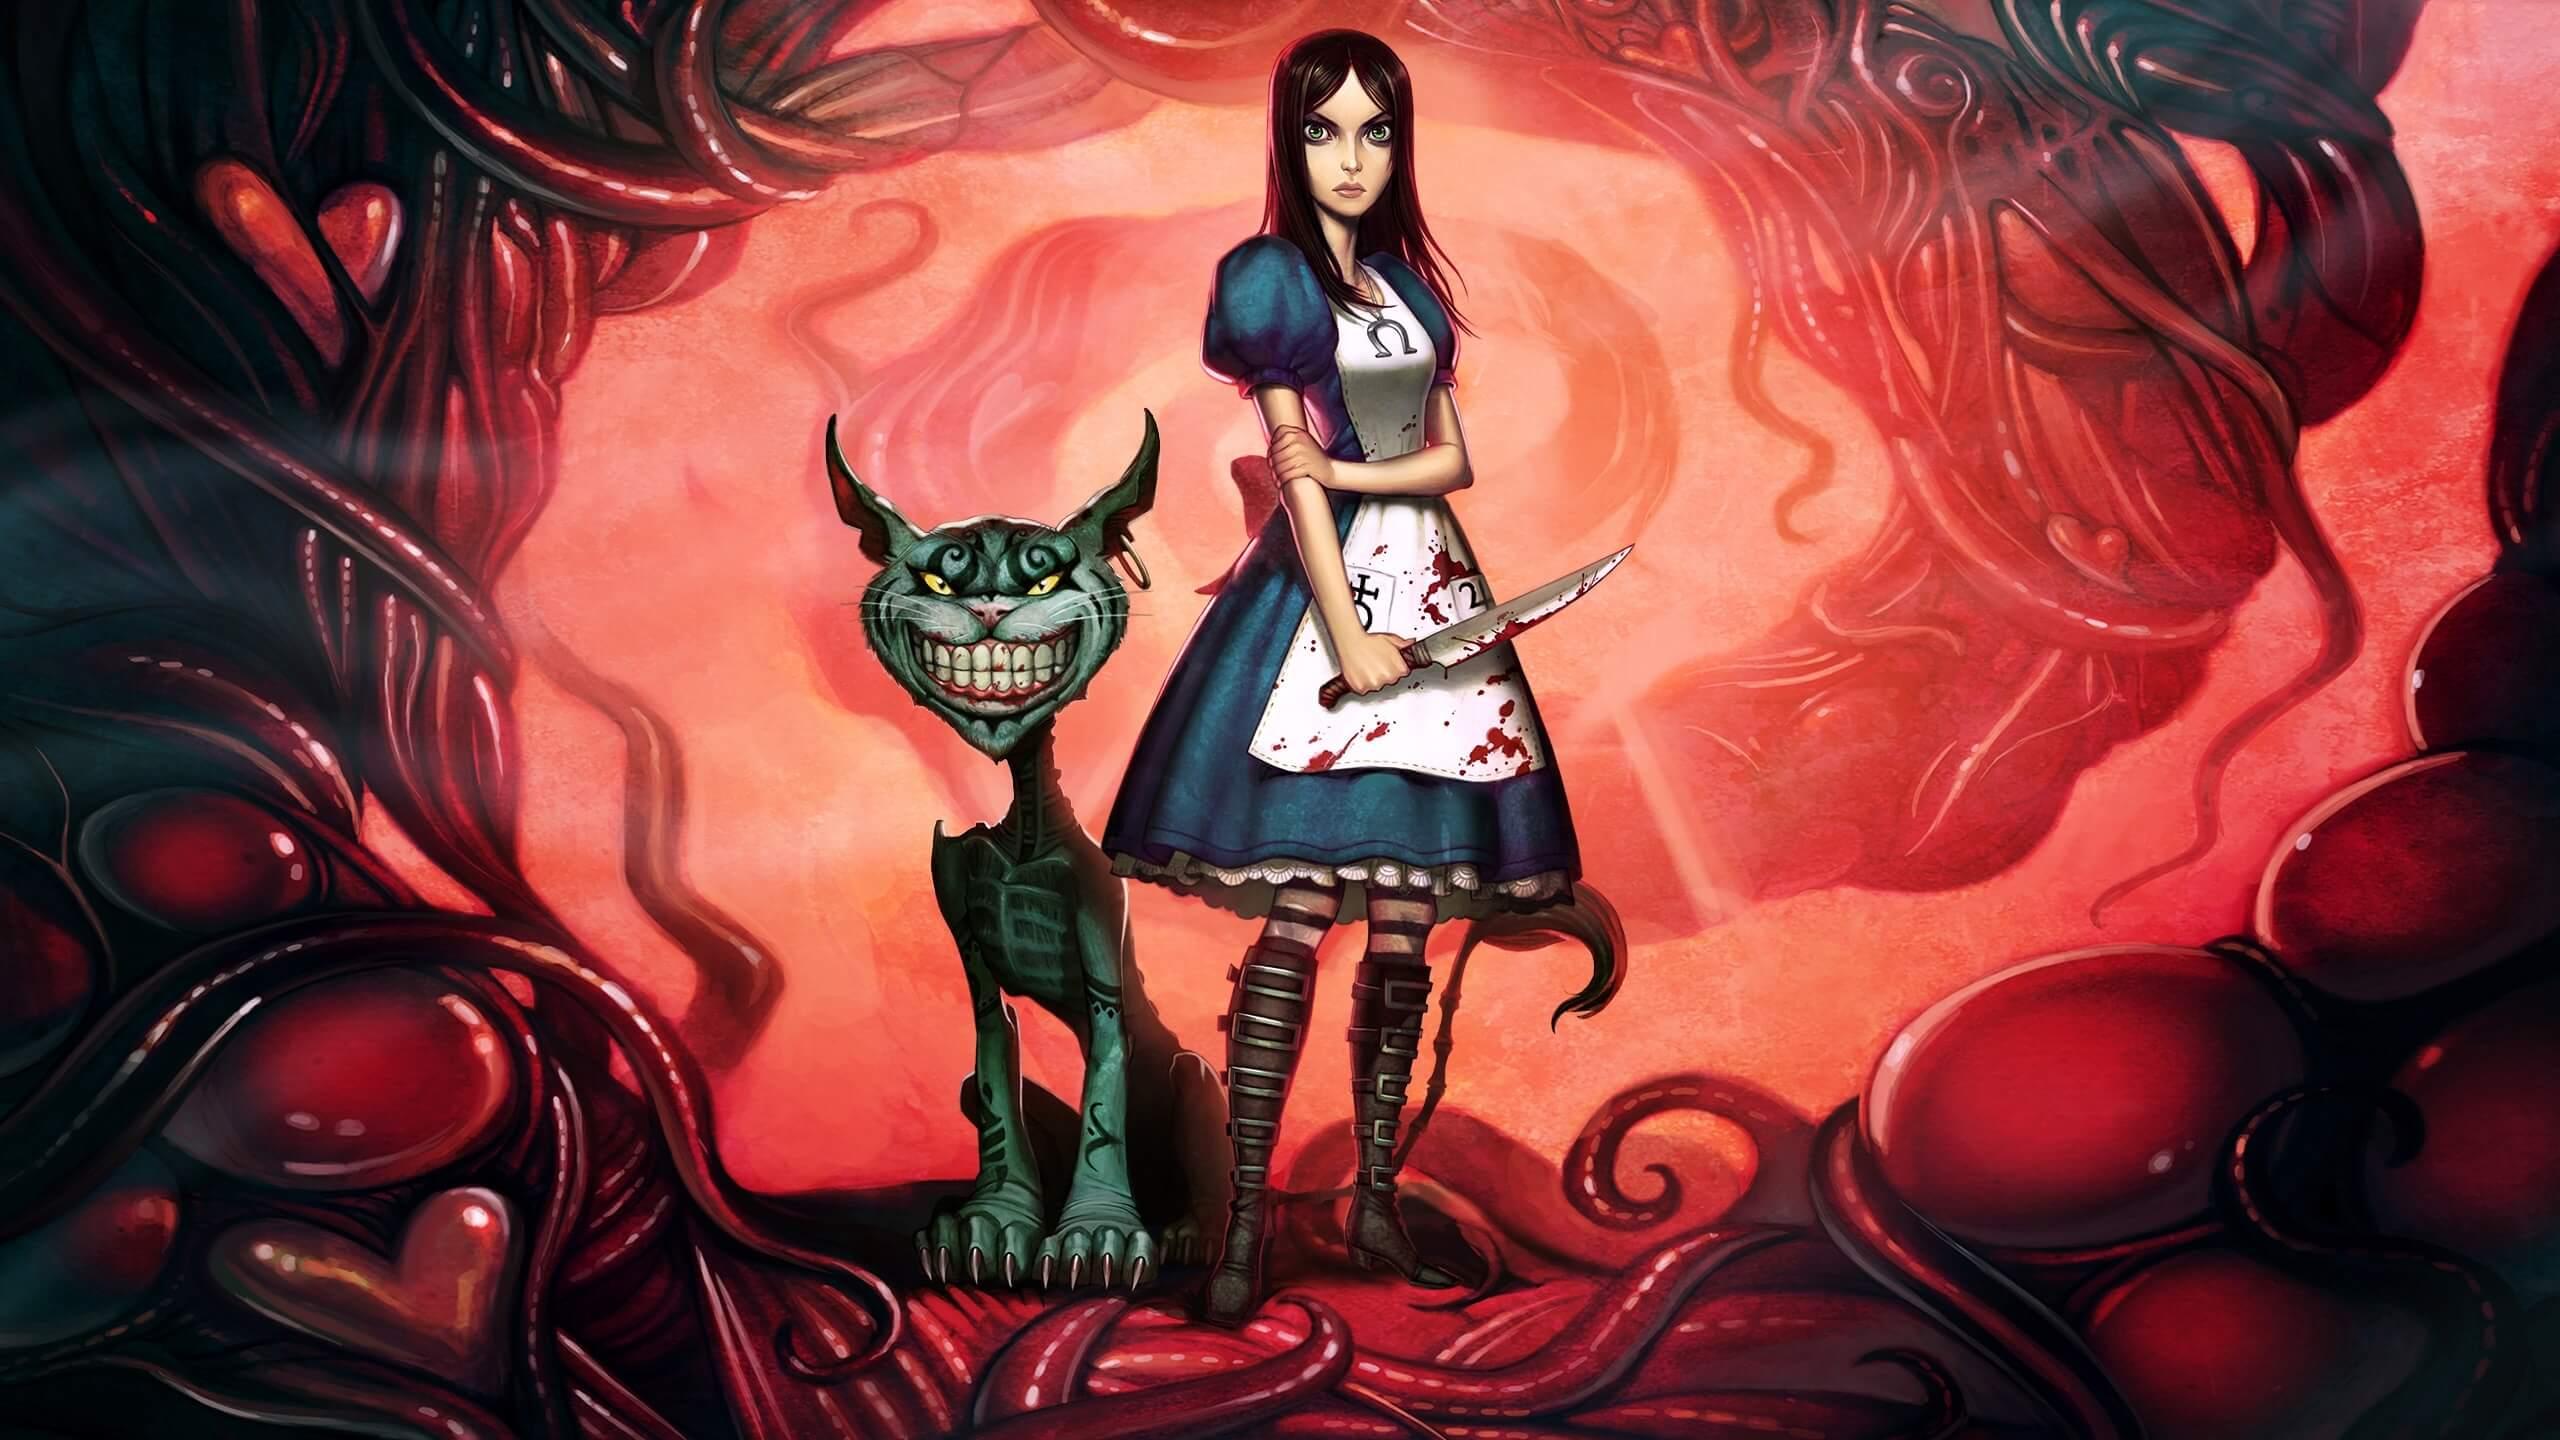 Games like Psychonauts 2